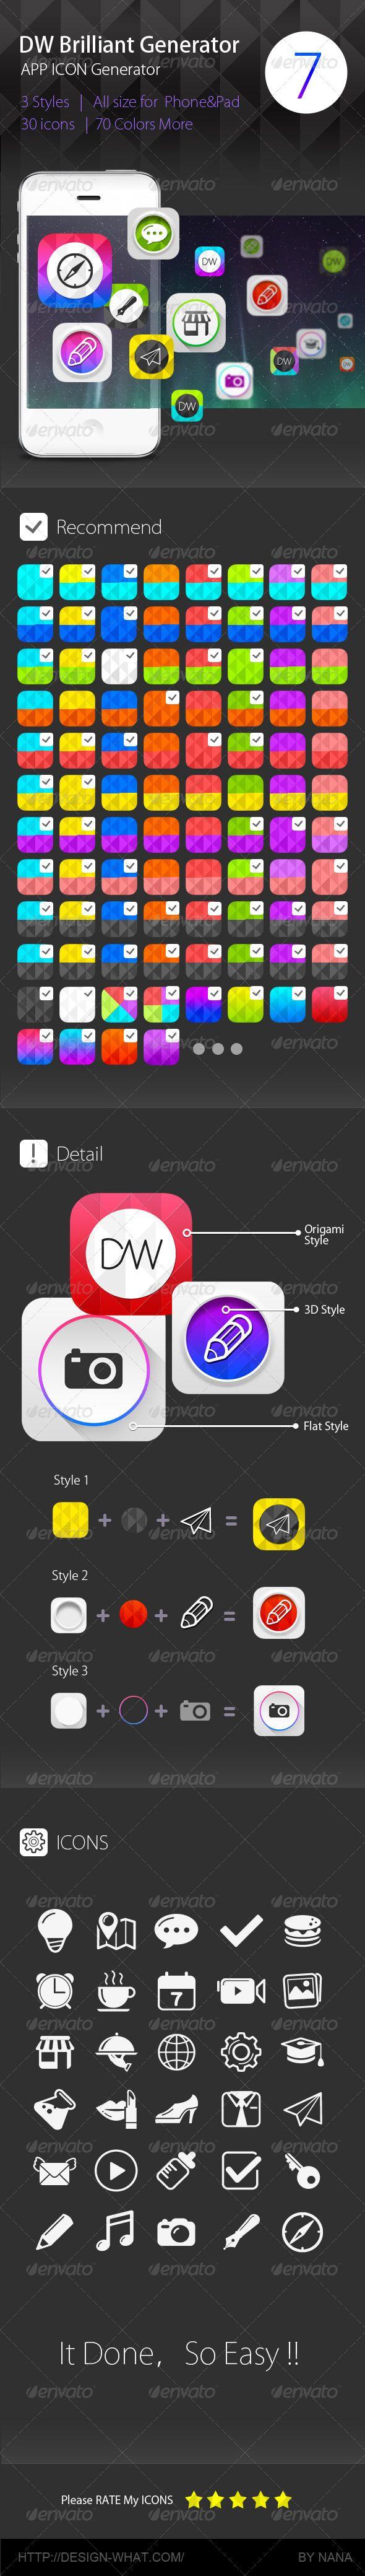 Brilliant APP ICON Generator for DW | Buy and Download: http://graphicriver.net/item/brilliant-app-icon-generator-for-dw/6000502?WT.ac=category_thumb&WT.z_author=90Box&ref=ksioks